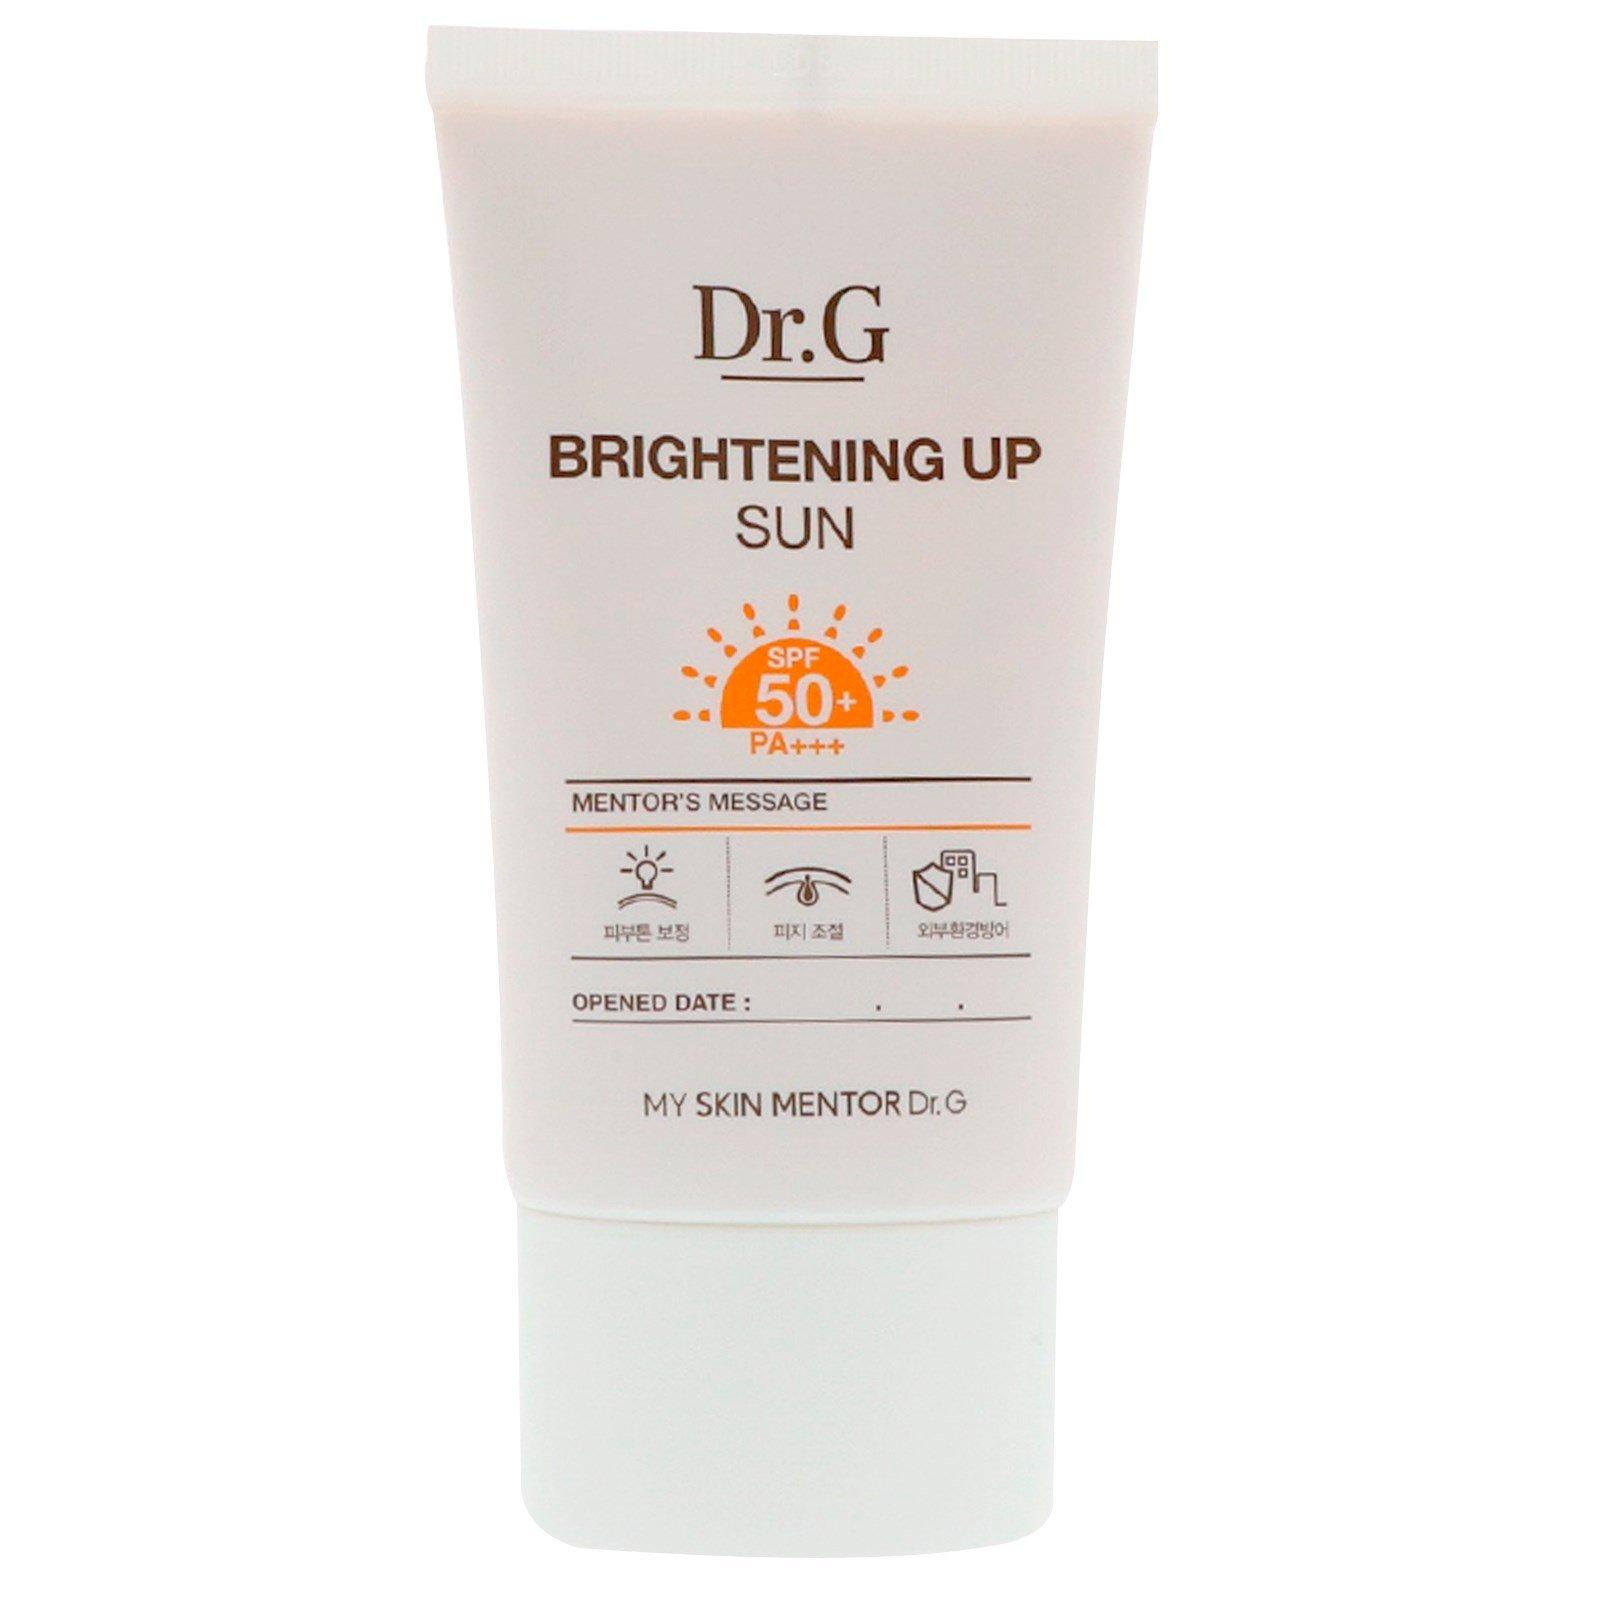 Dr. G, A-Clear, Oil Control Sun Cream SPF50+ PA++, 1.69 fl oz (pack of 2) harris pharma 5% benzoyl perox wash, 8 ounce